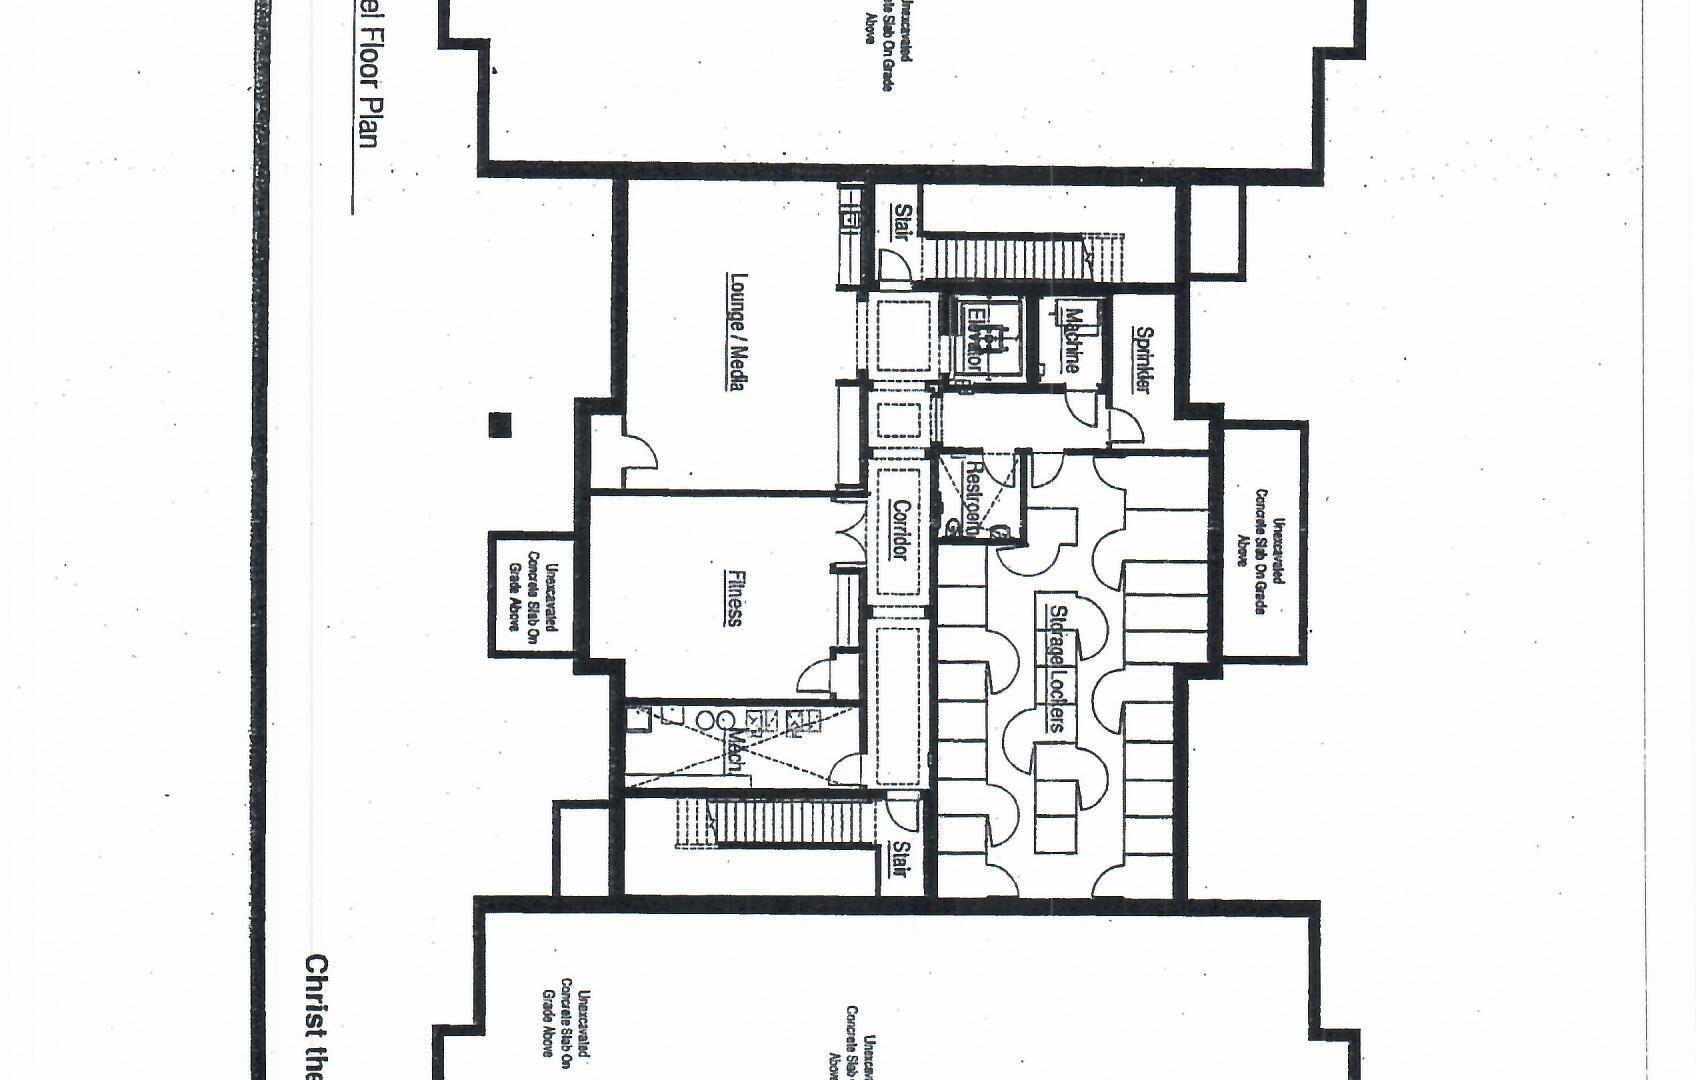 floor plan_0004.jpg